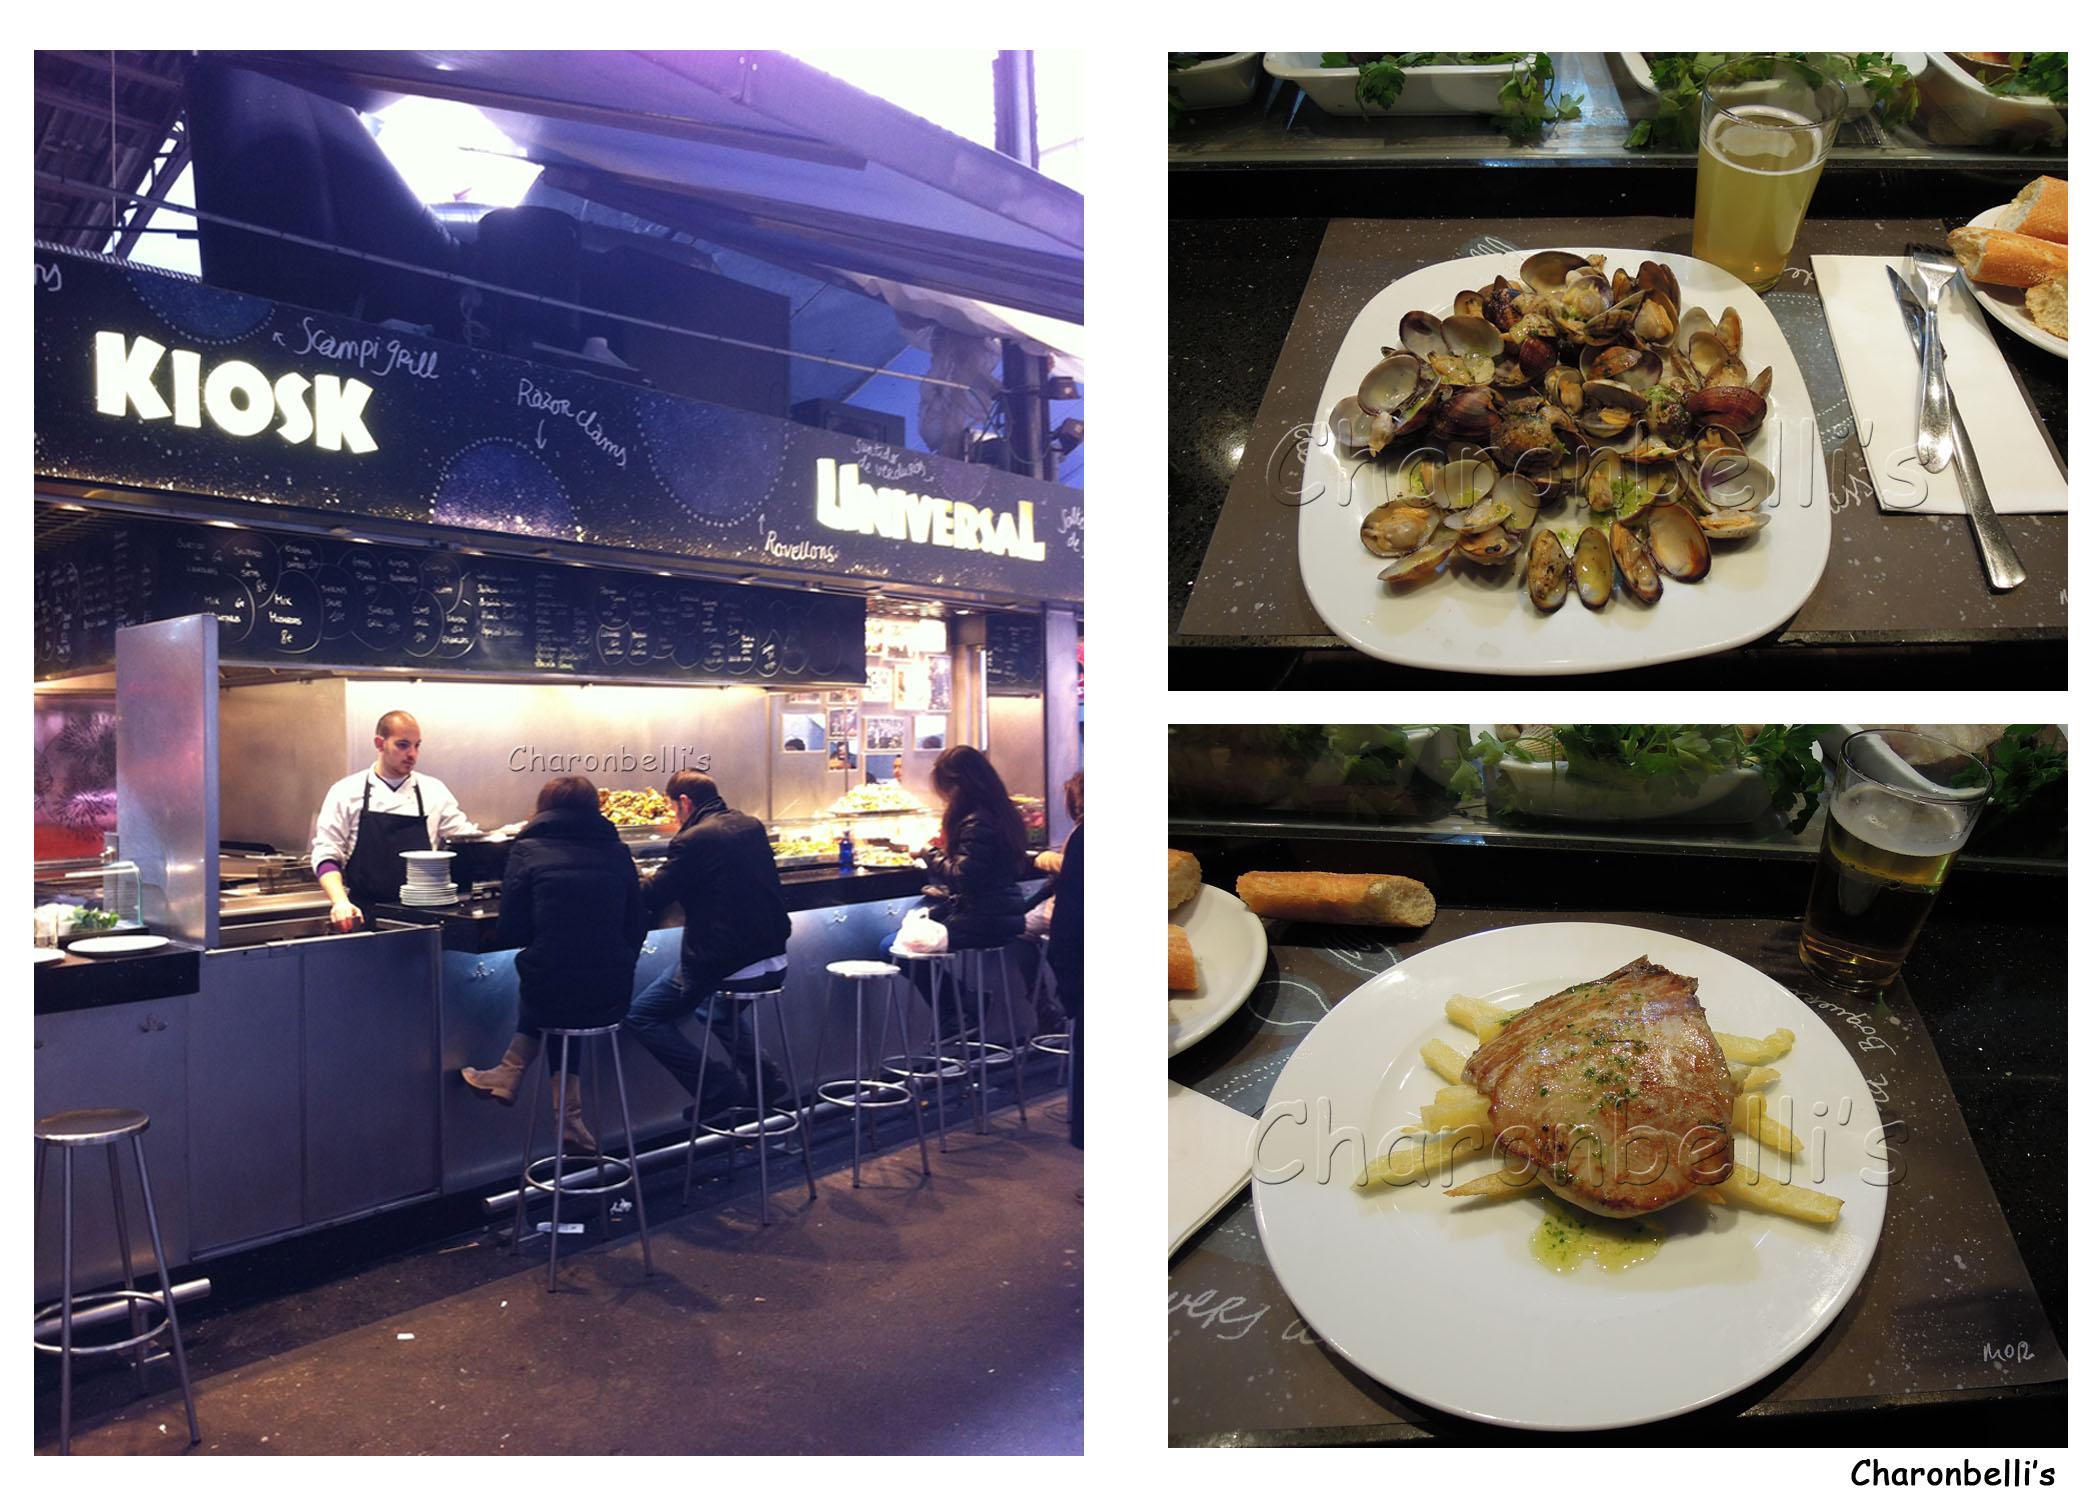 Barcelone - Kiosk Universal - Charonbelli's blog de voyages